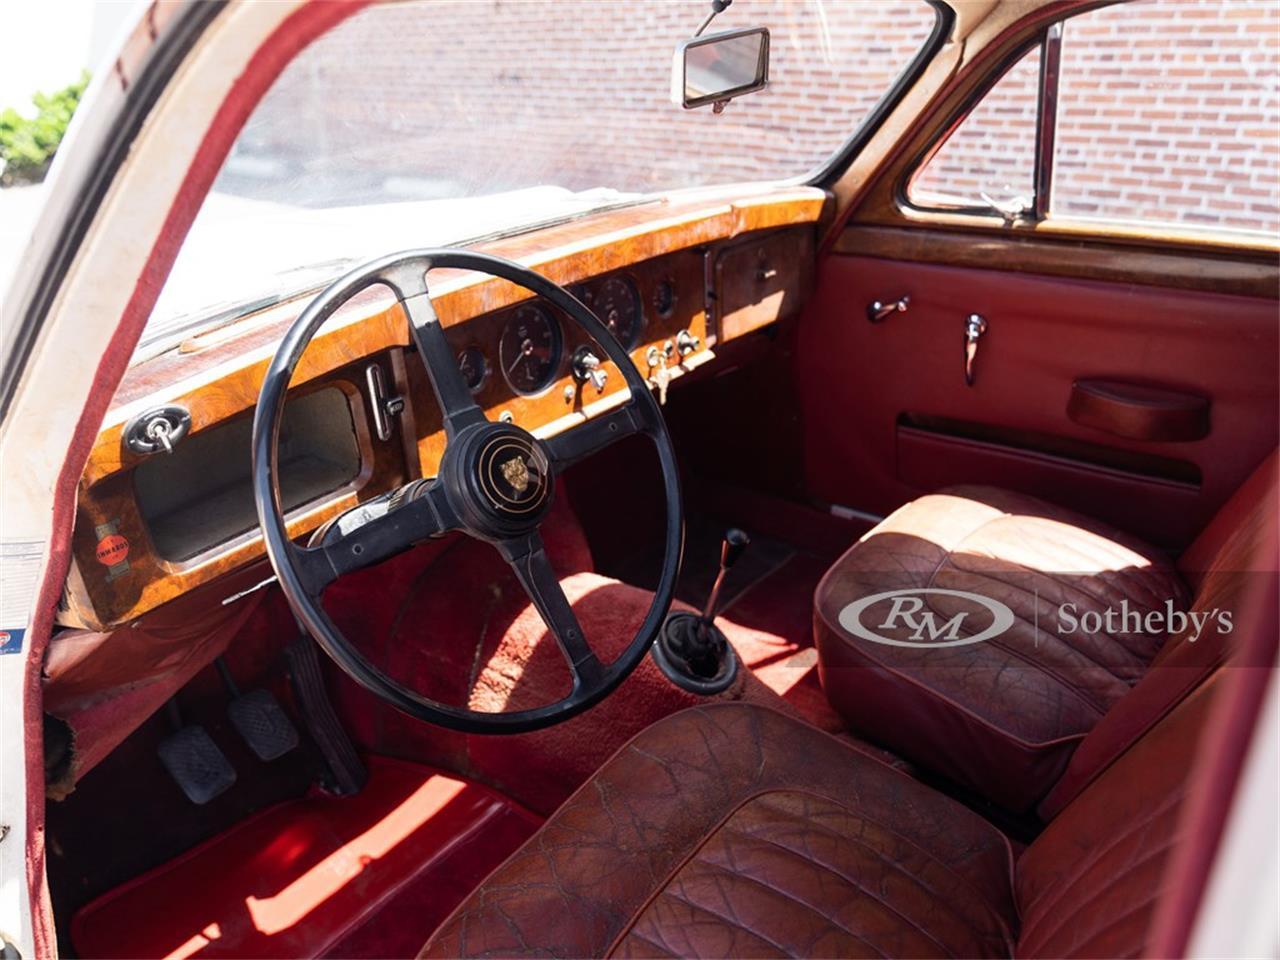 1959 Jaguar Mark I (CC-1382530) for sale in Online, California